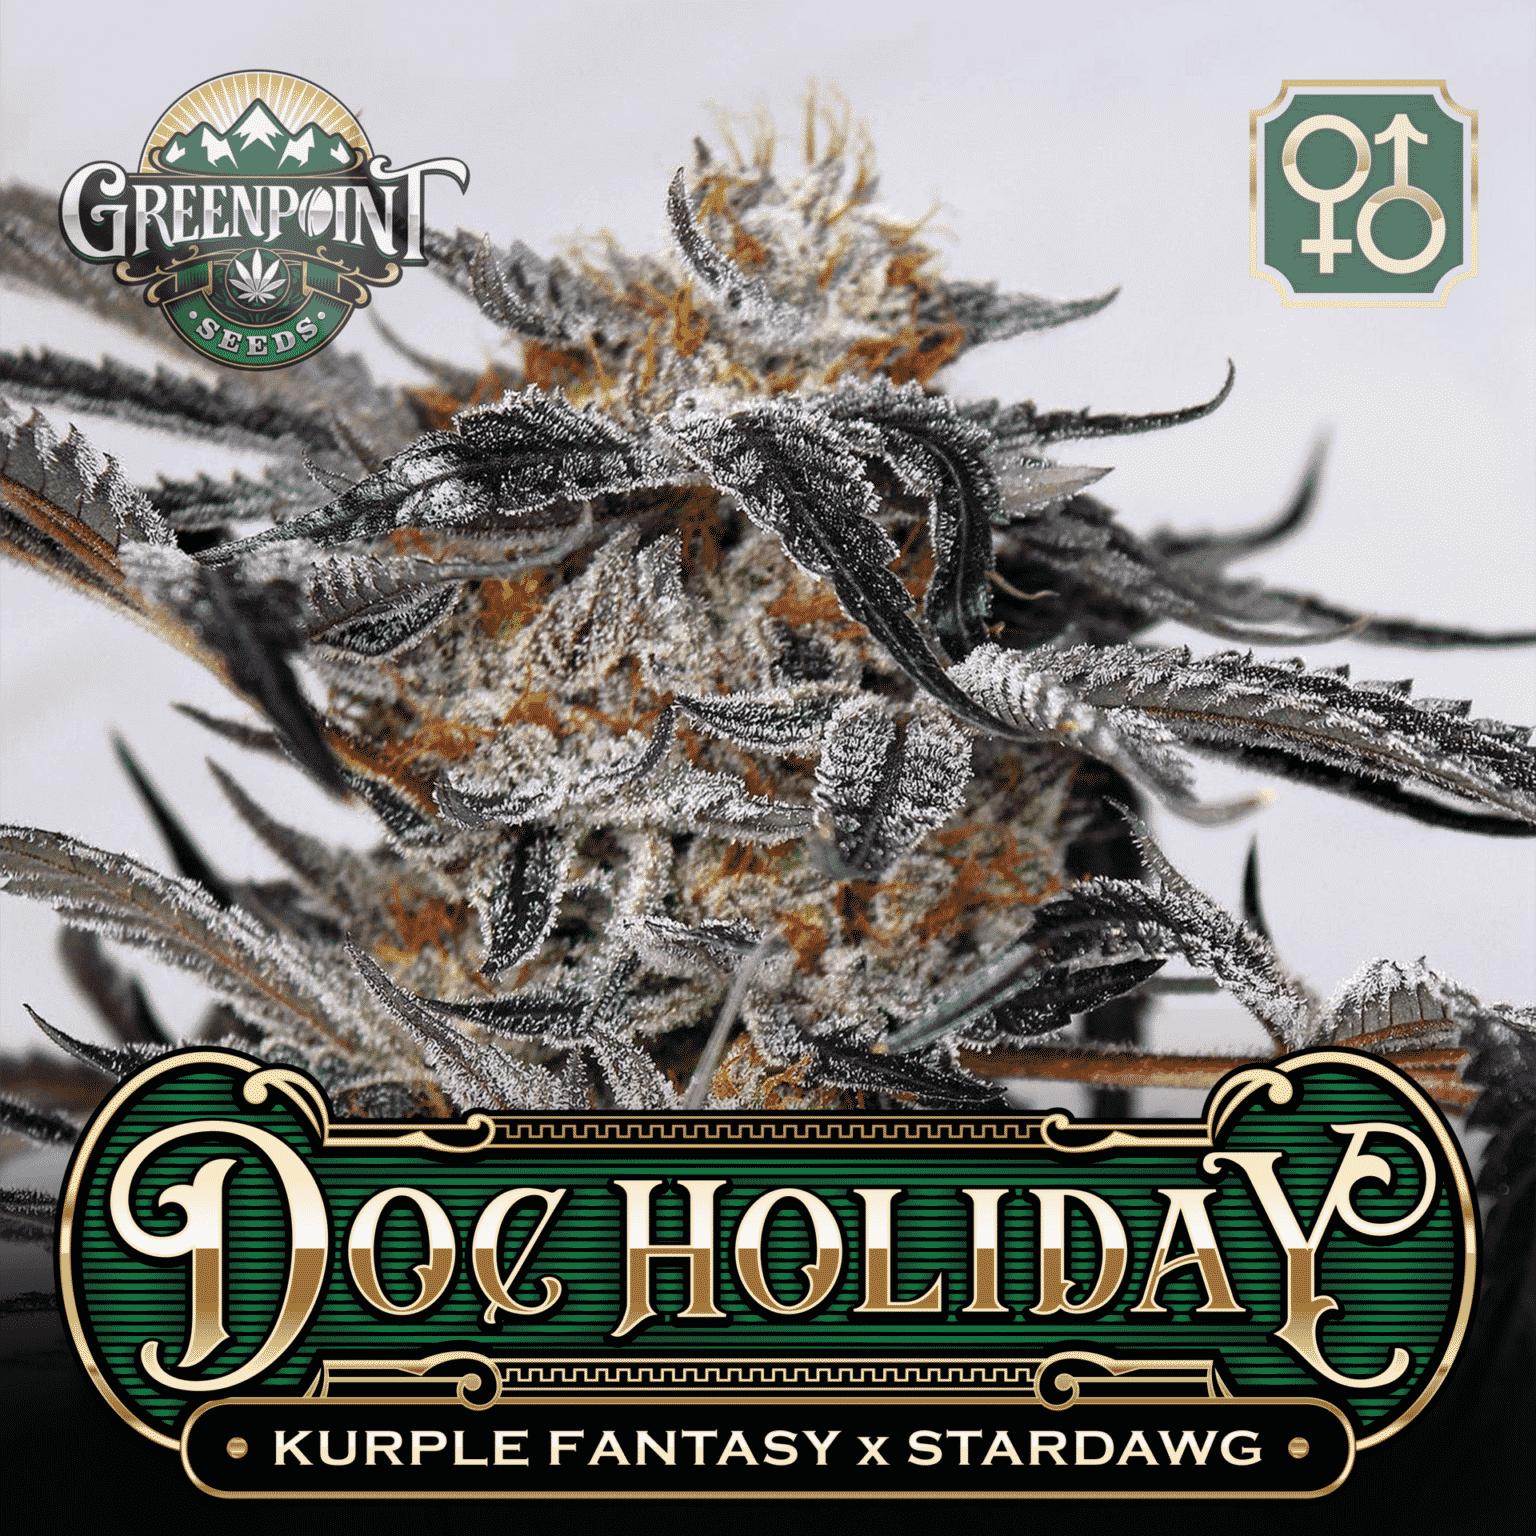 Kurple Fantasy x Stardawg Seeds | Doc Holiday Cannabis Seeds - US Seed Bank